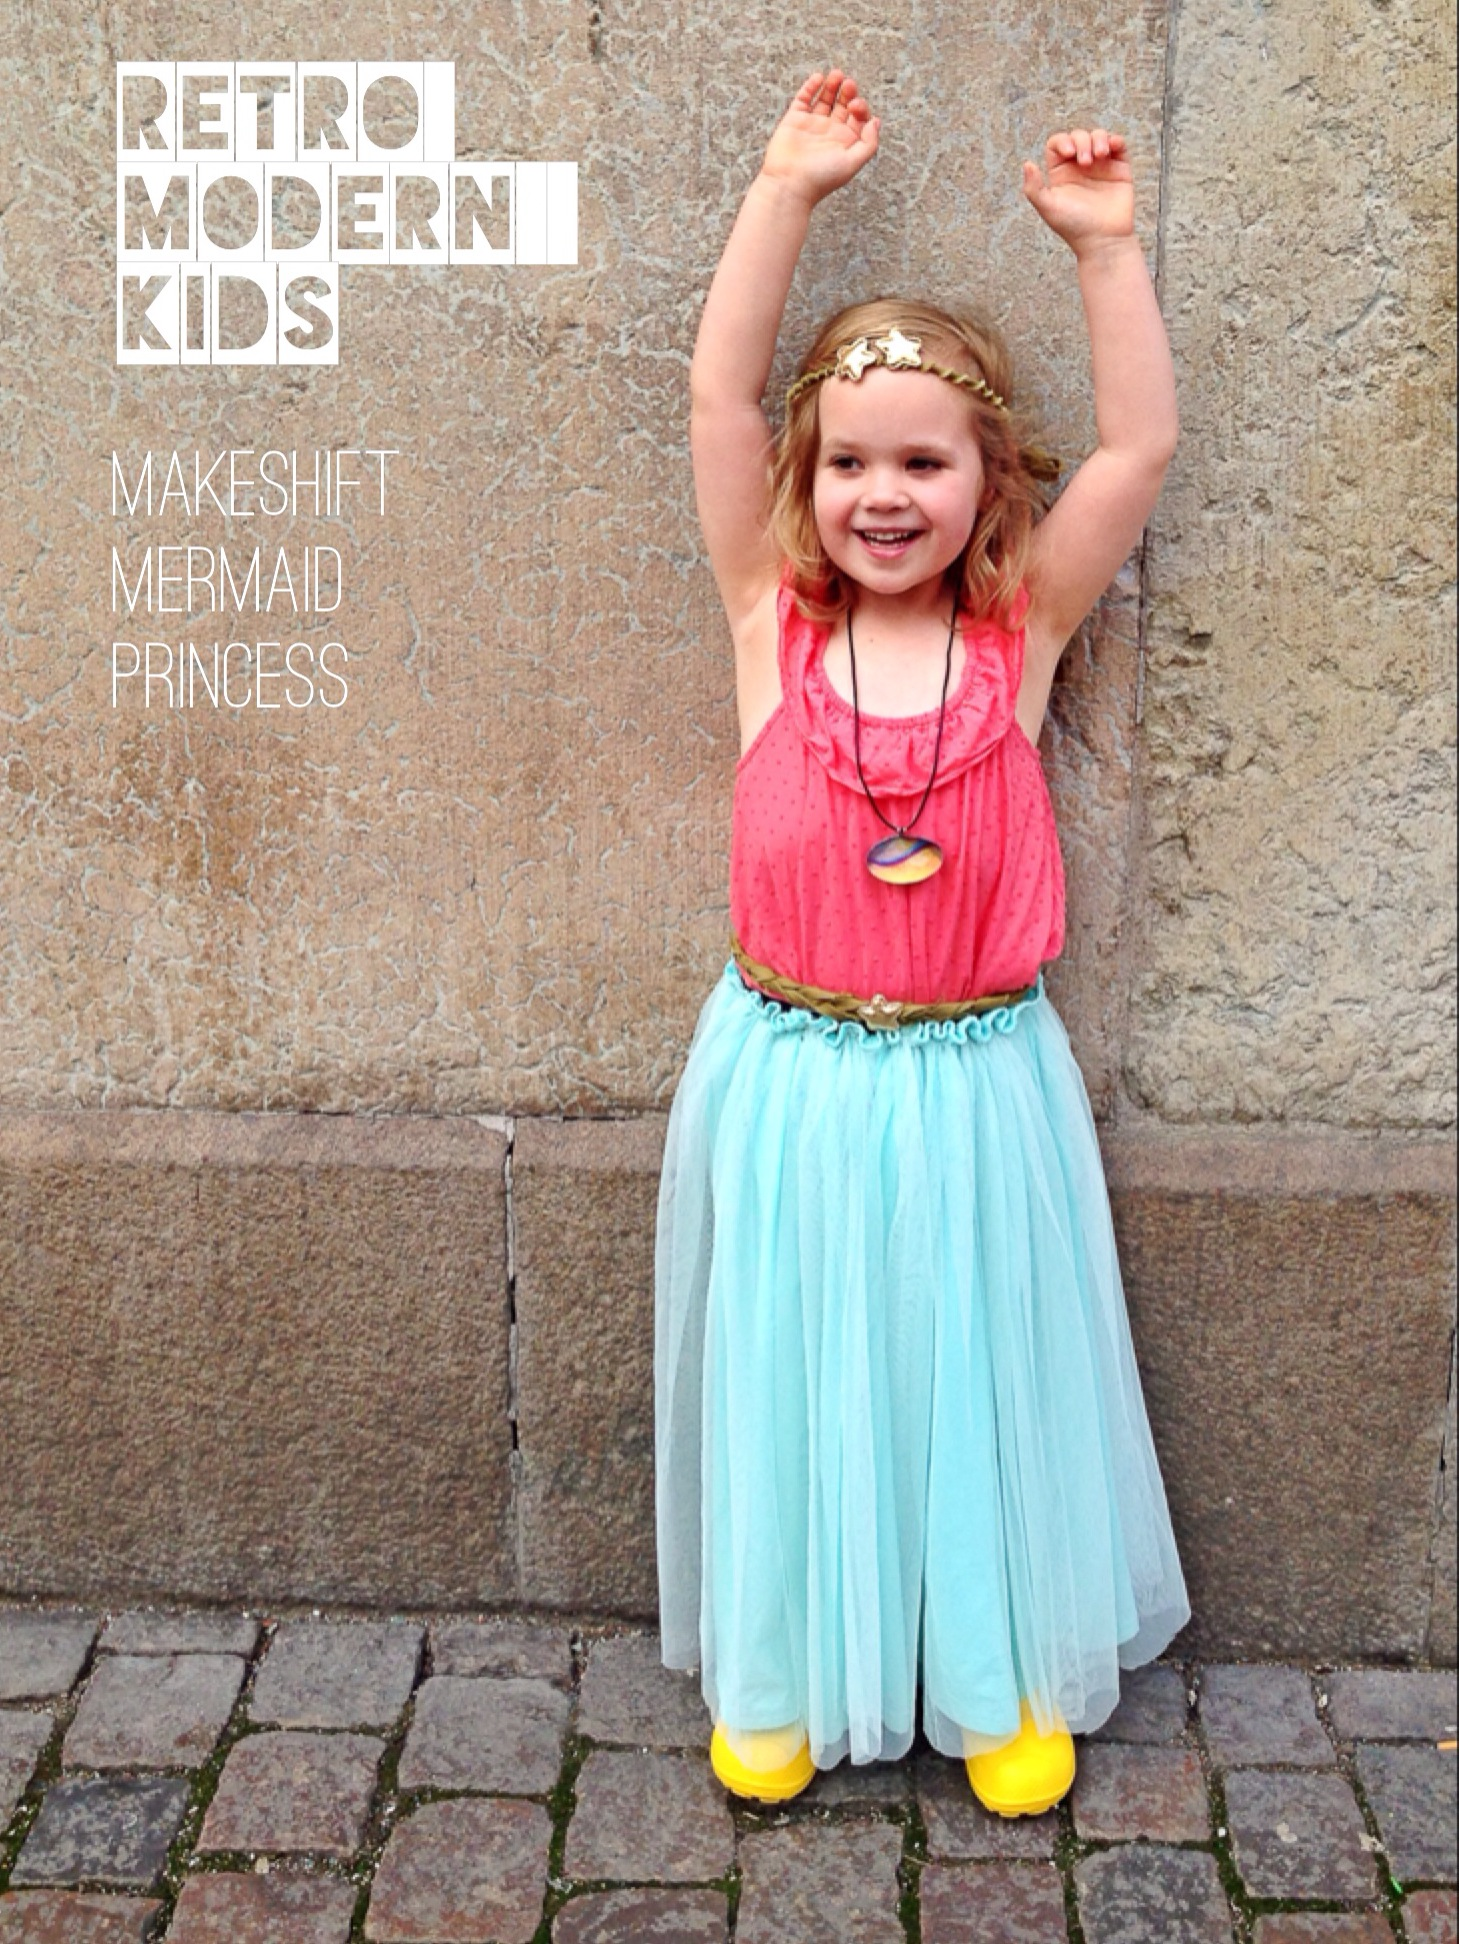 Makeshift Mermaid Princess costume by Retro Modern Kids